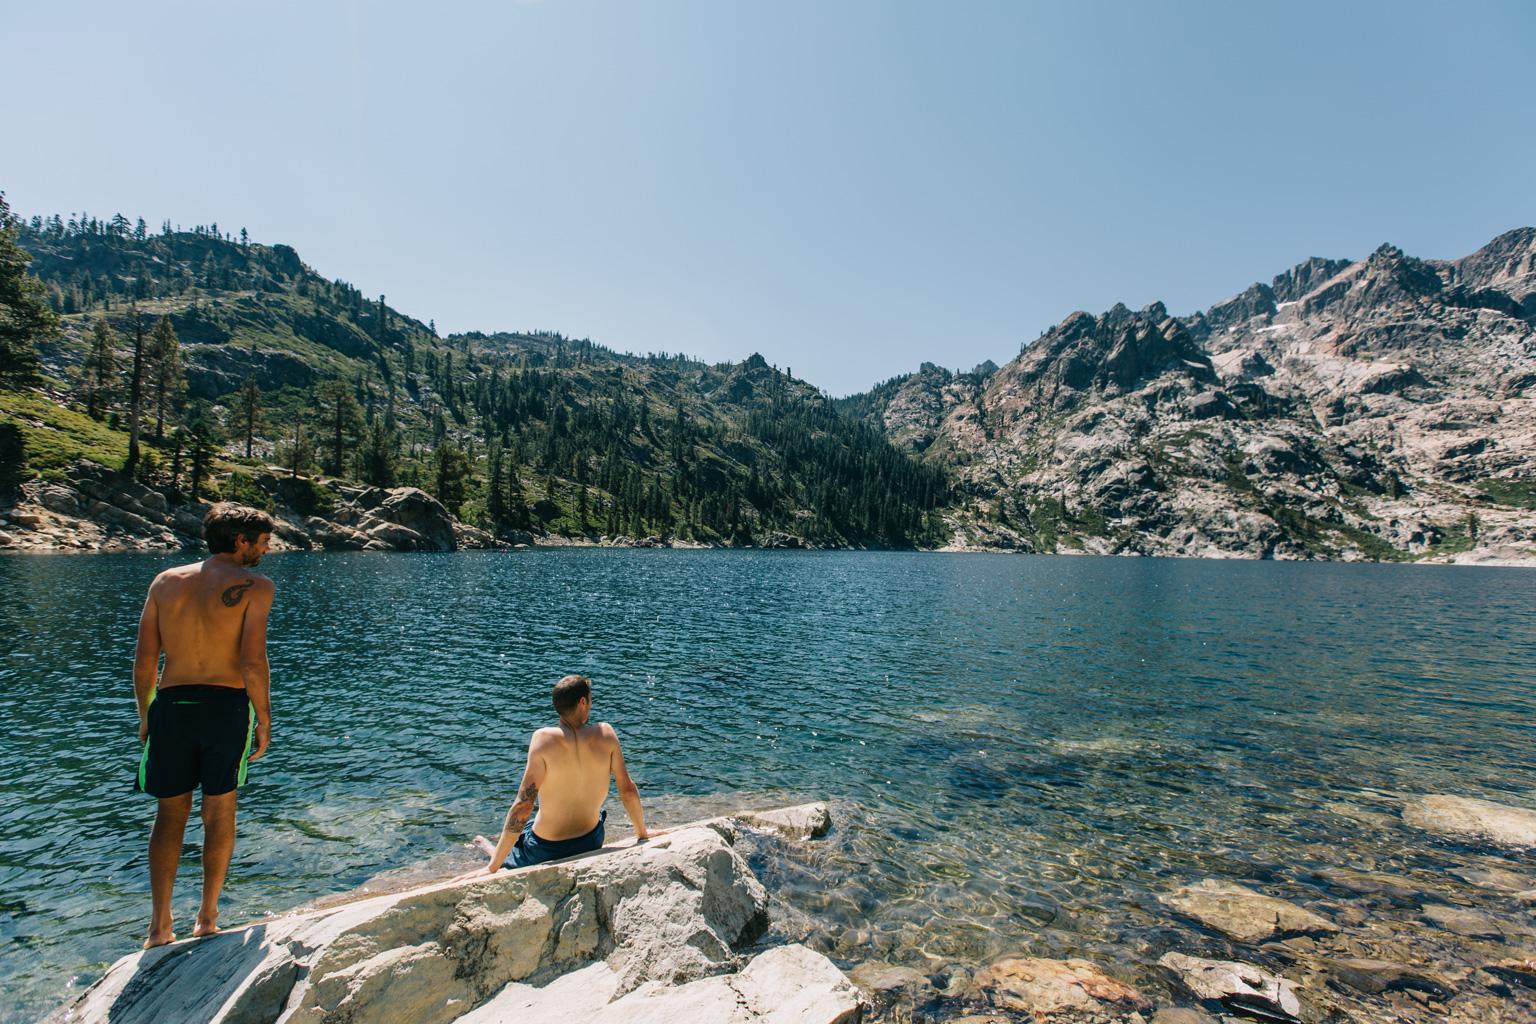 CindyGiovagnoli_outdoors_photographer_Sierra_Buttes_firetower_watchtower_Sardine_Snag_Bear_lake_hike_swim_camp-053.jpg